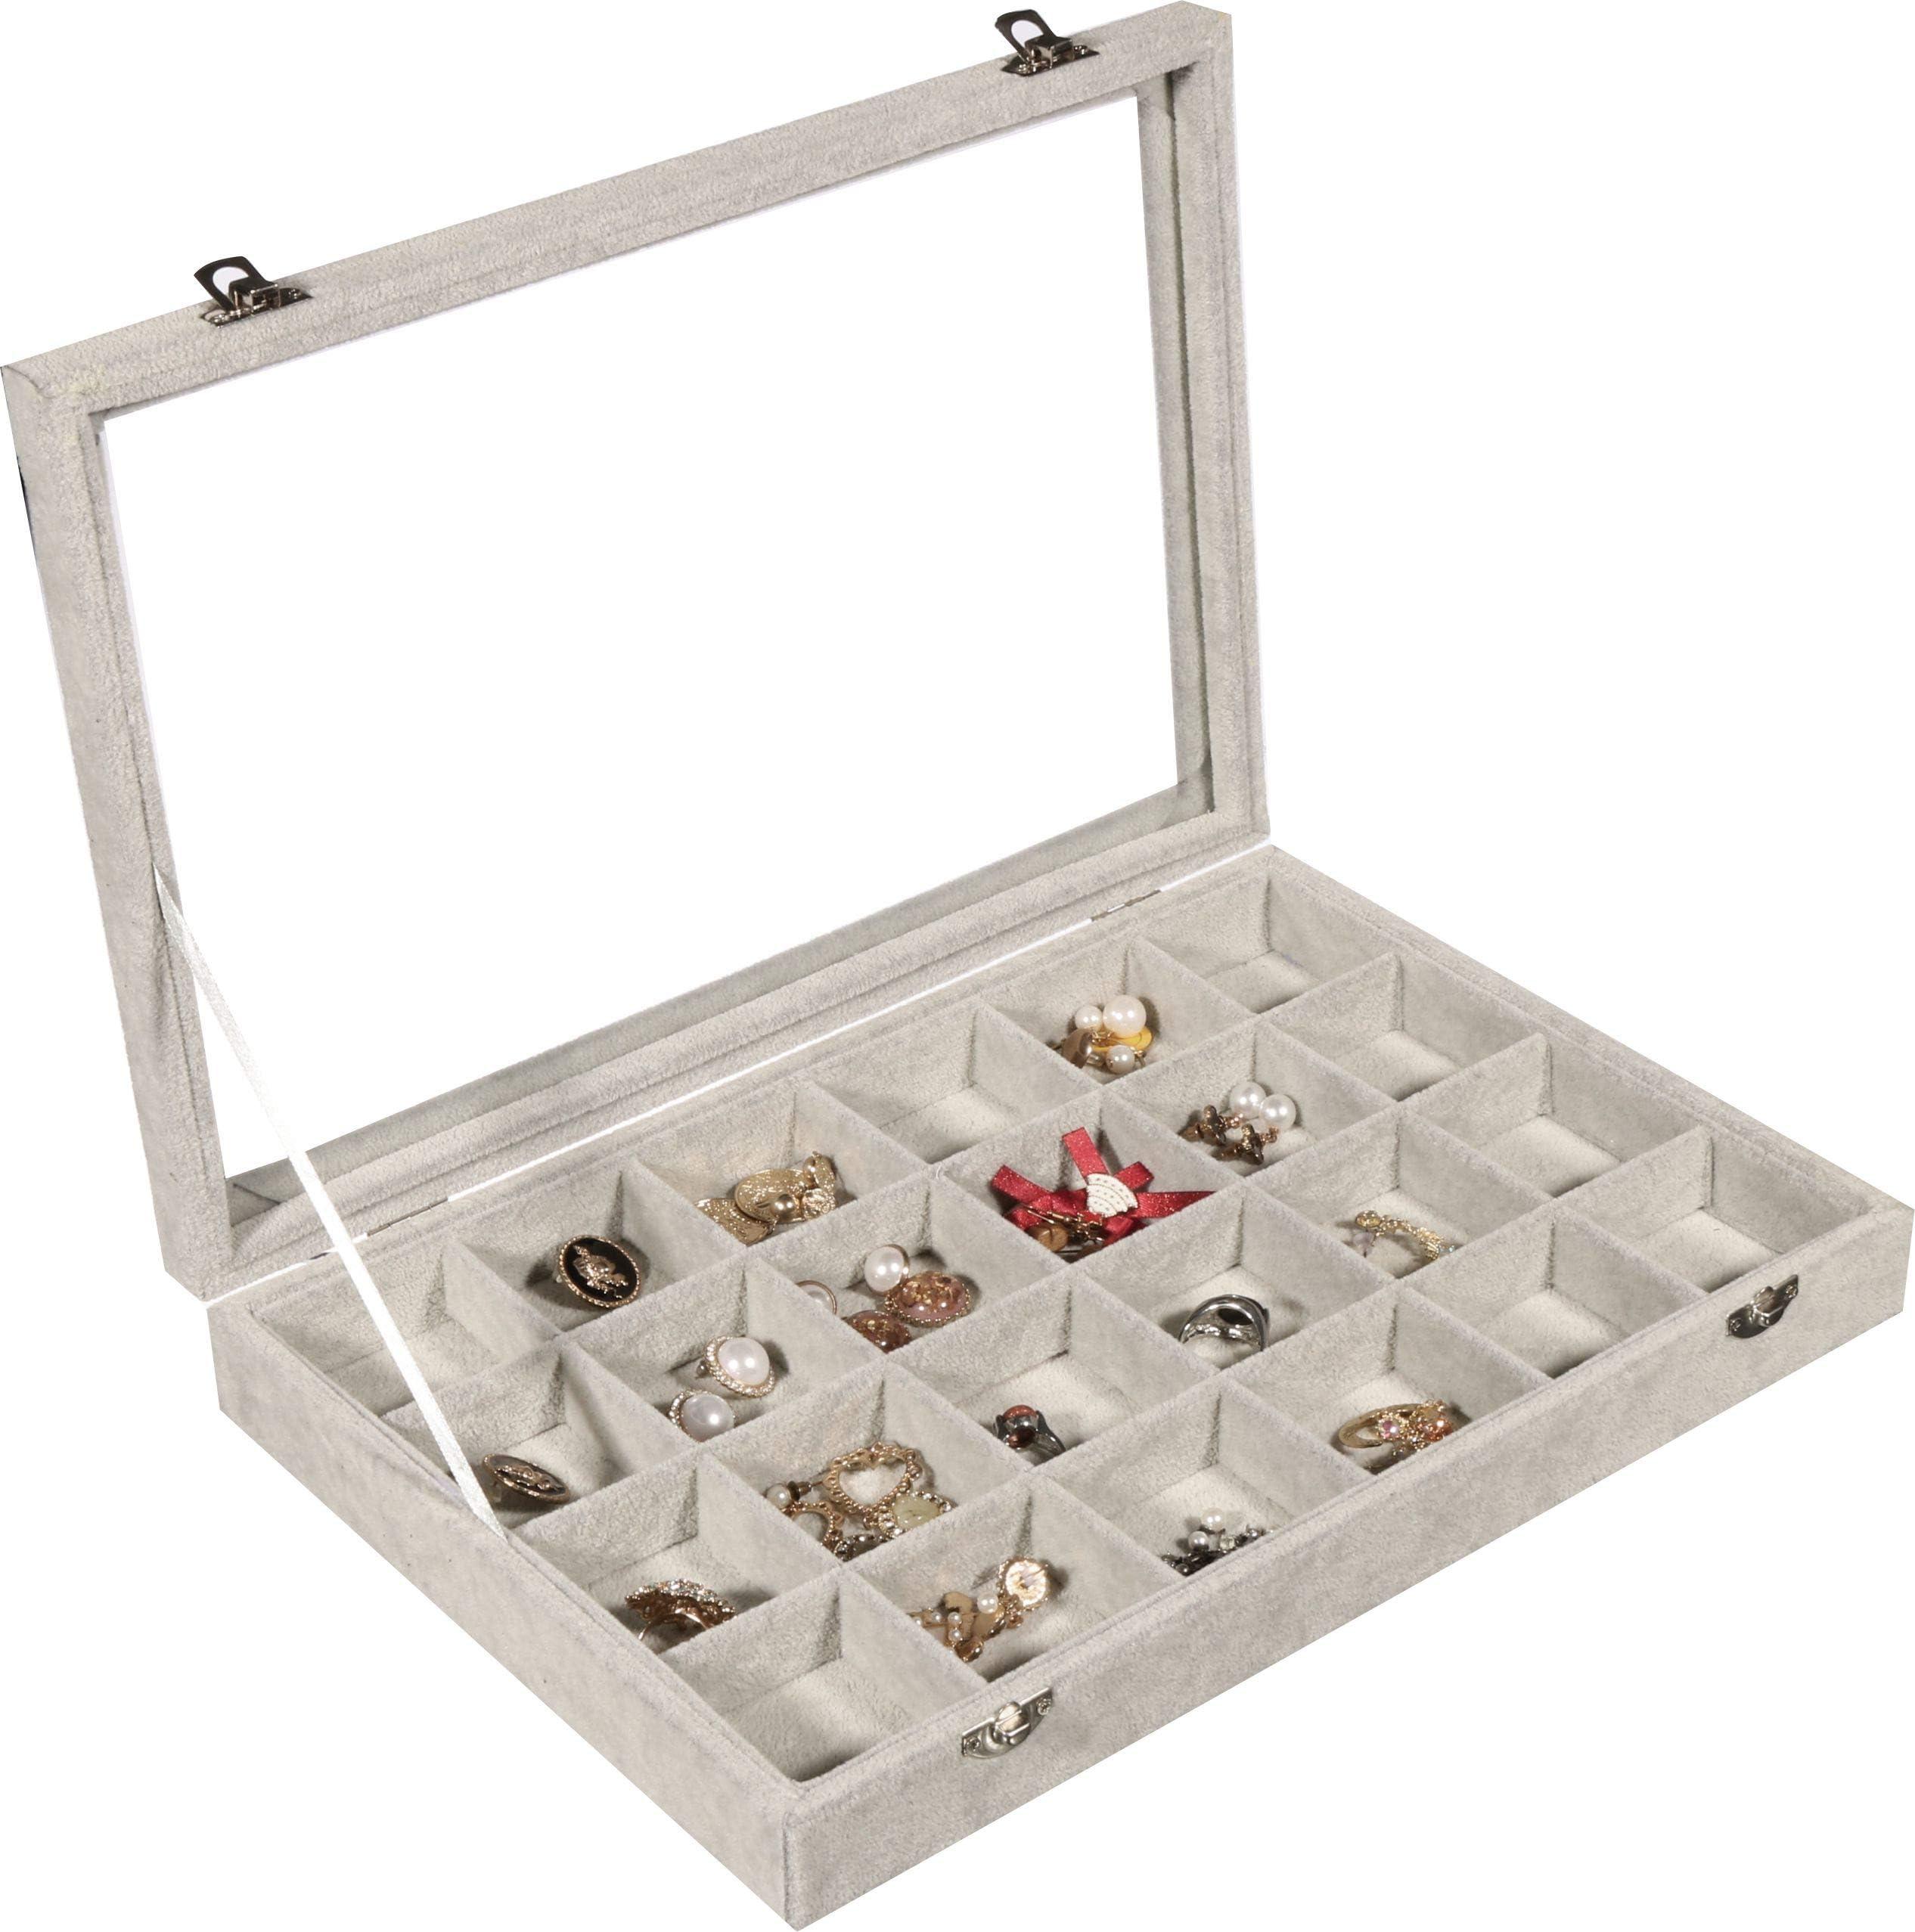 Ring Rolls Tray Insert Grid Jewelry Display Storage Box Tray Holder Showcase Pop